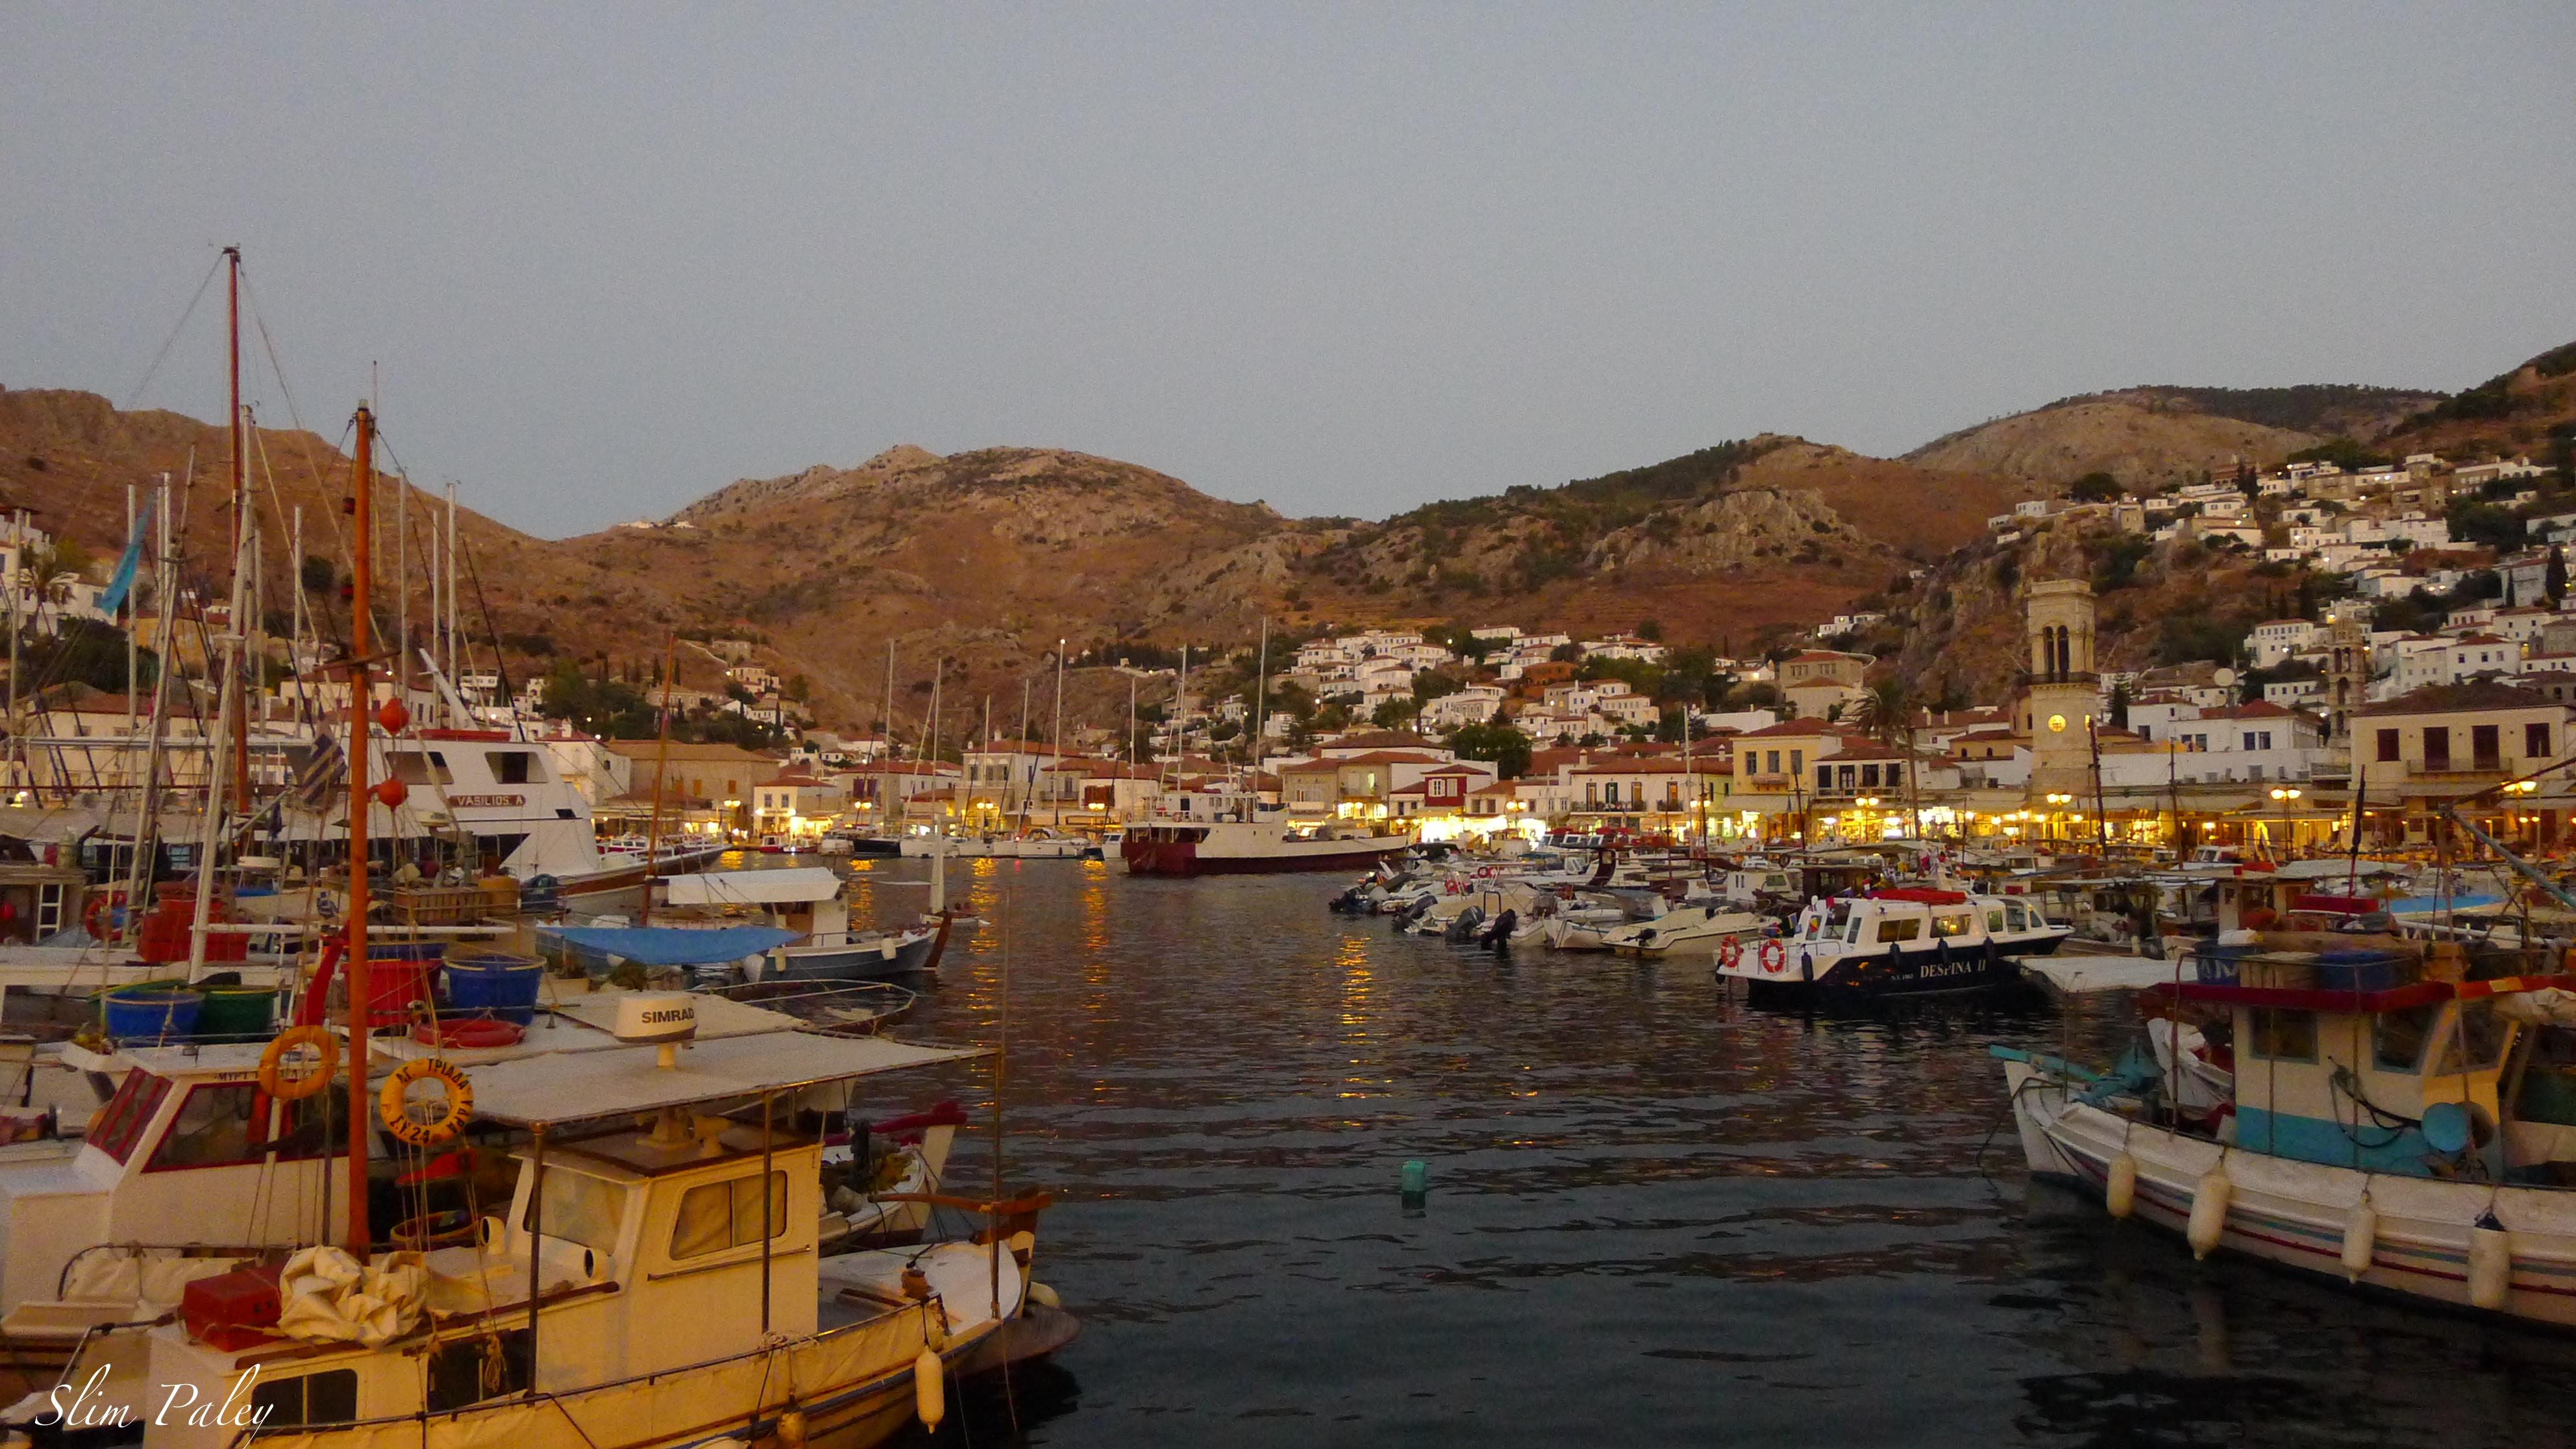 Port of Hydra, Greece